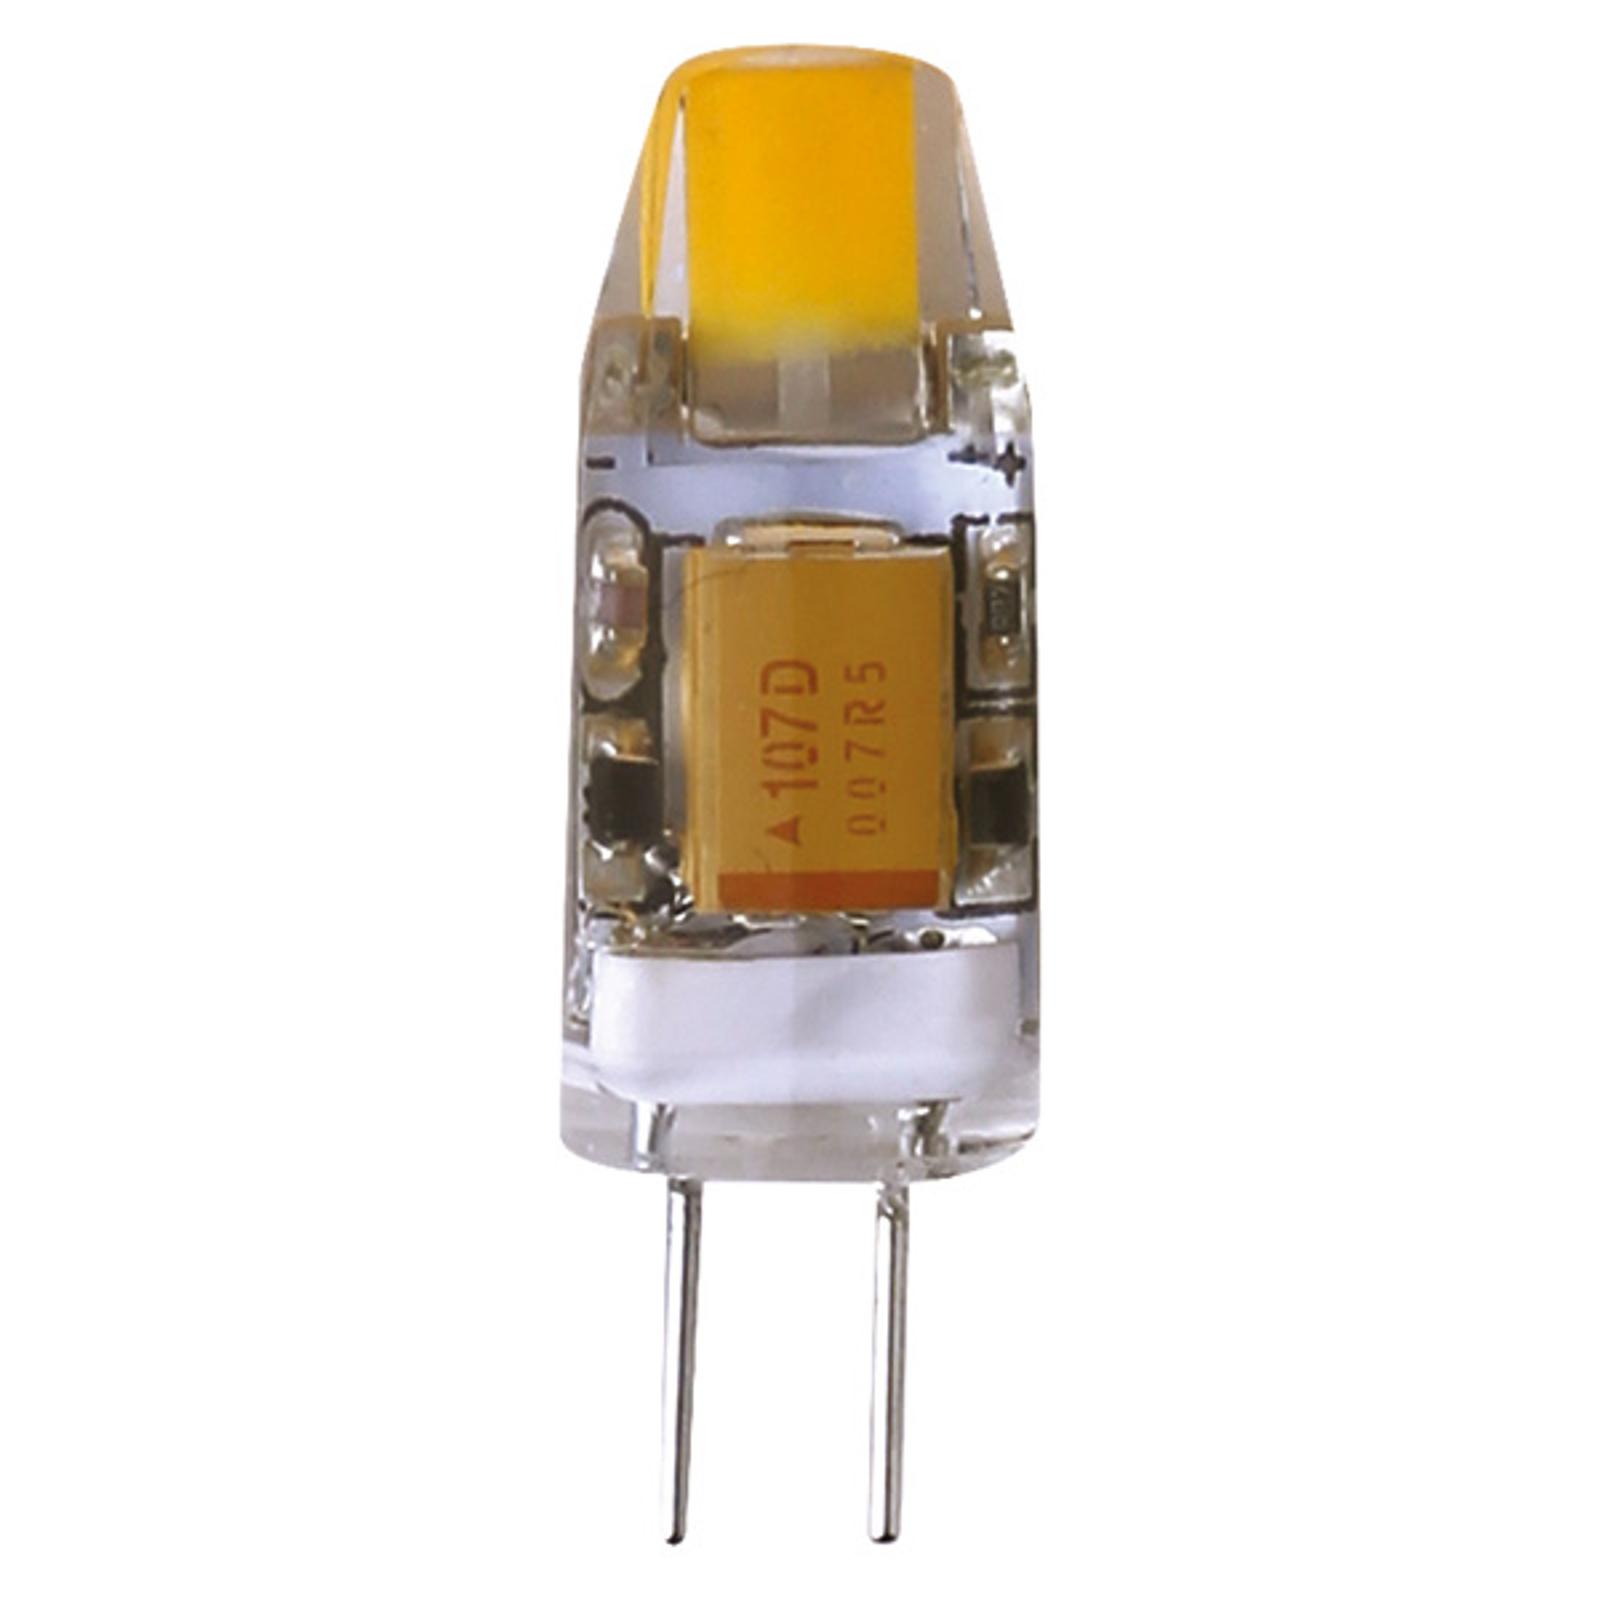 EG4 1,2W 828 LED stiftsokkellamp